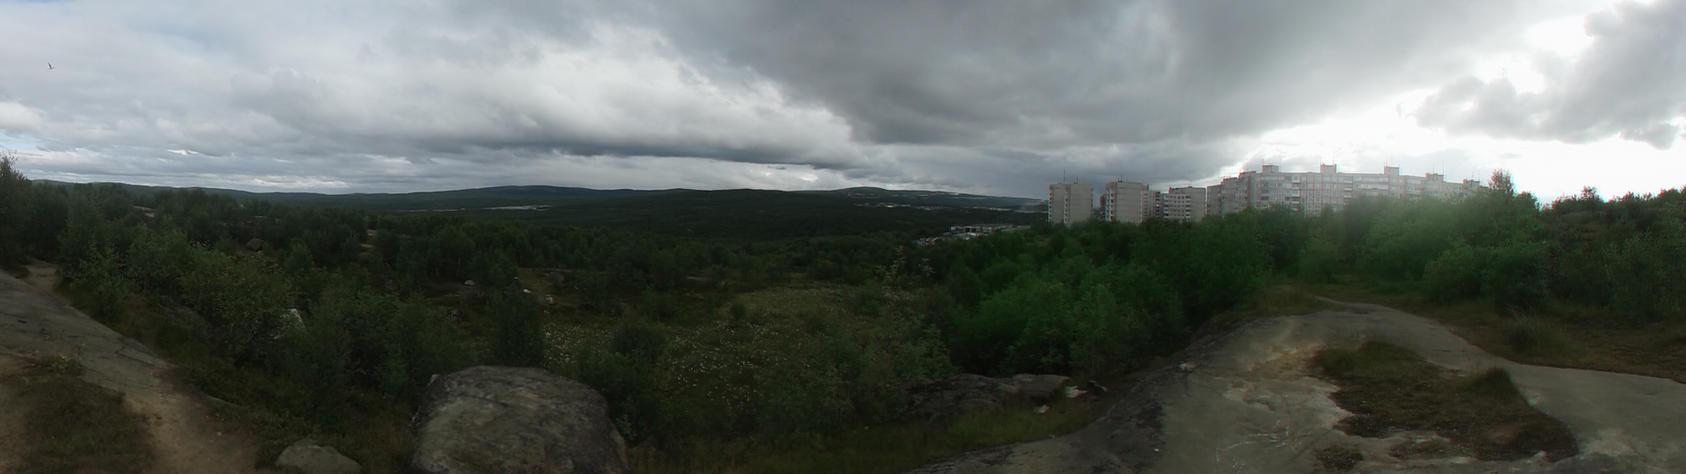 Murmansk, Sosnoviy Proezd by MrComrade